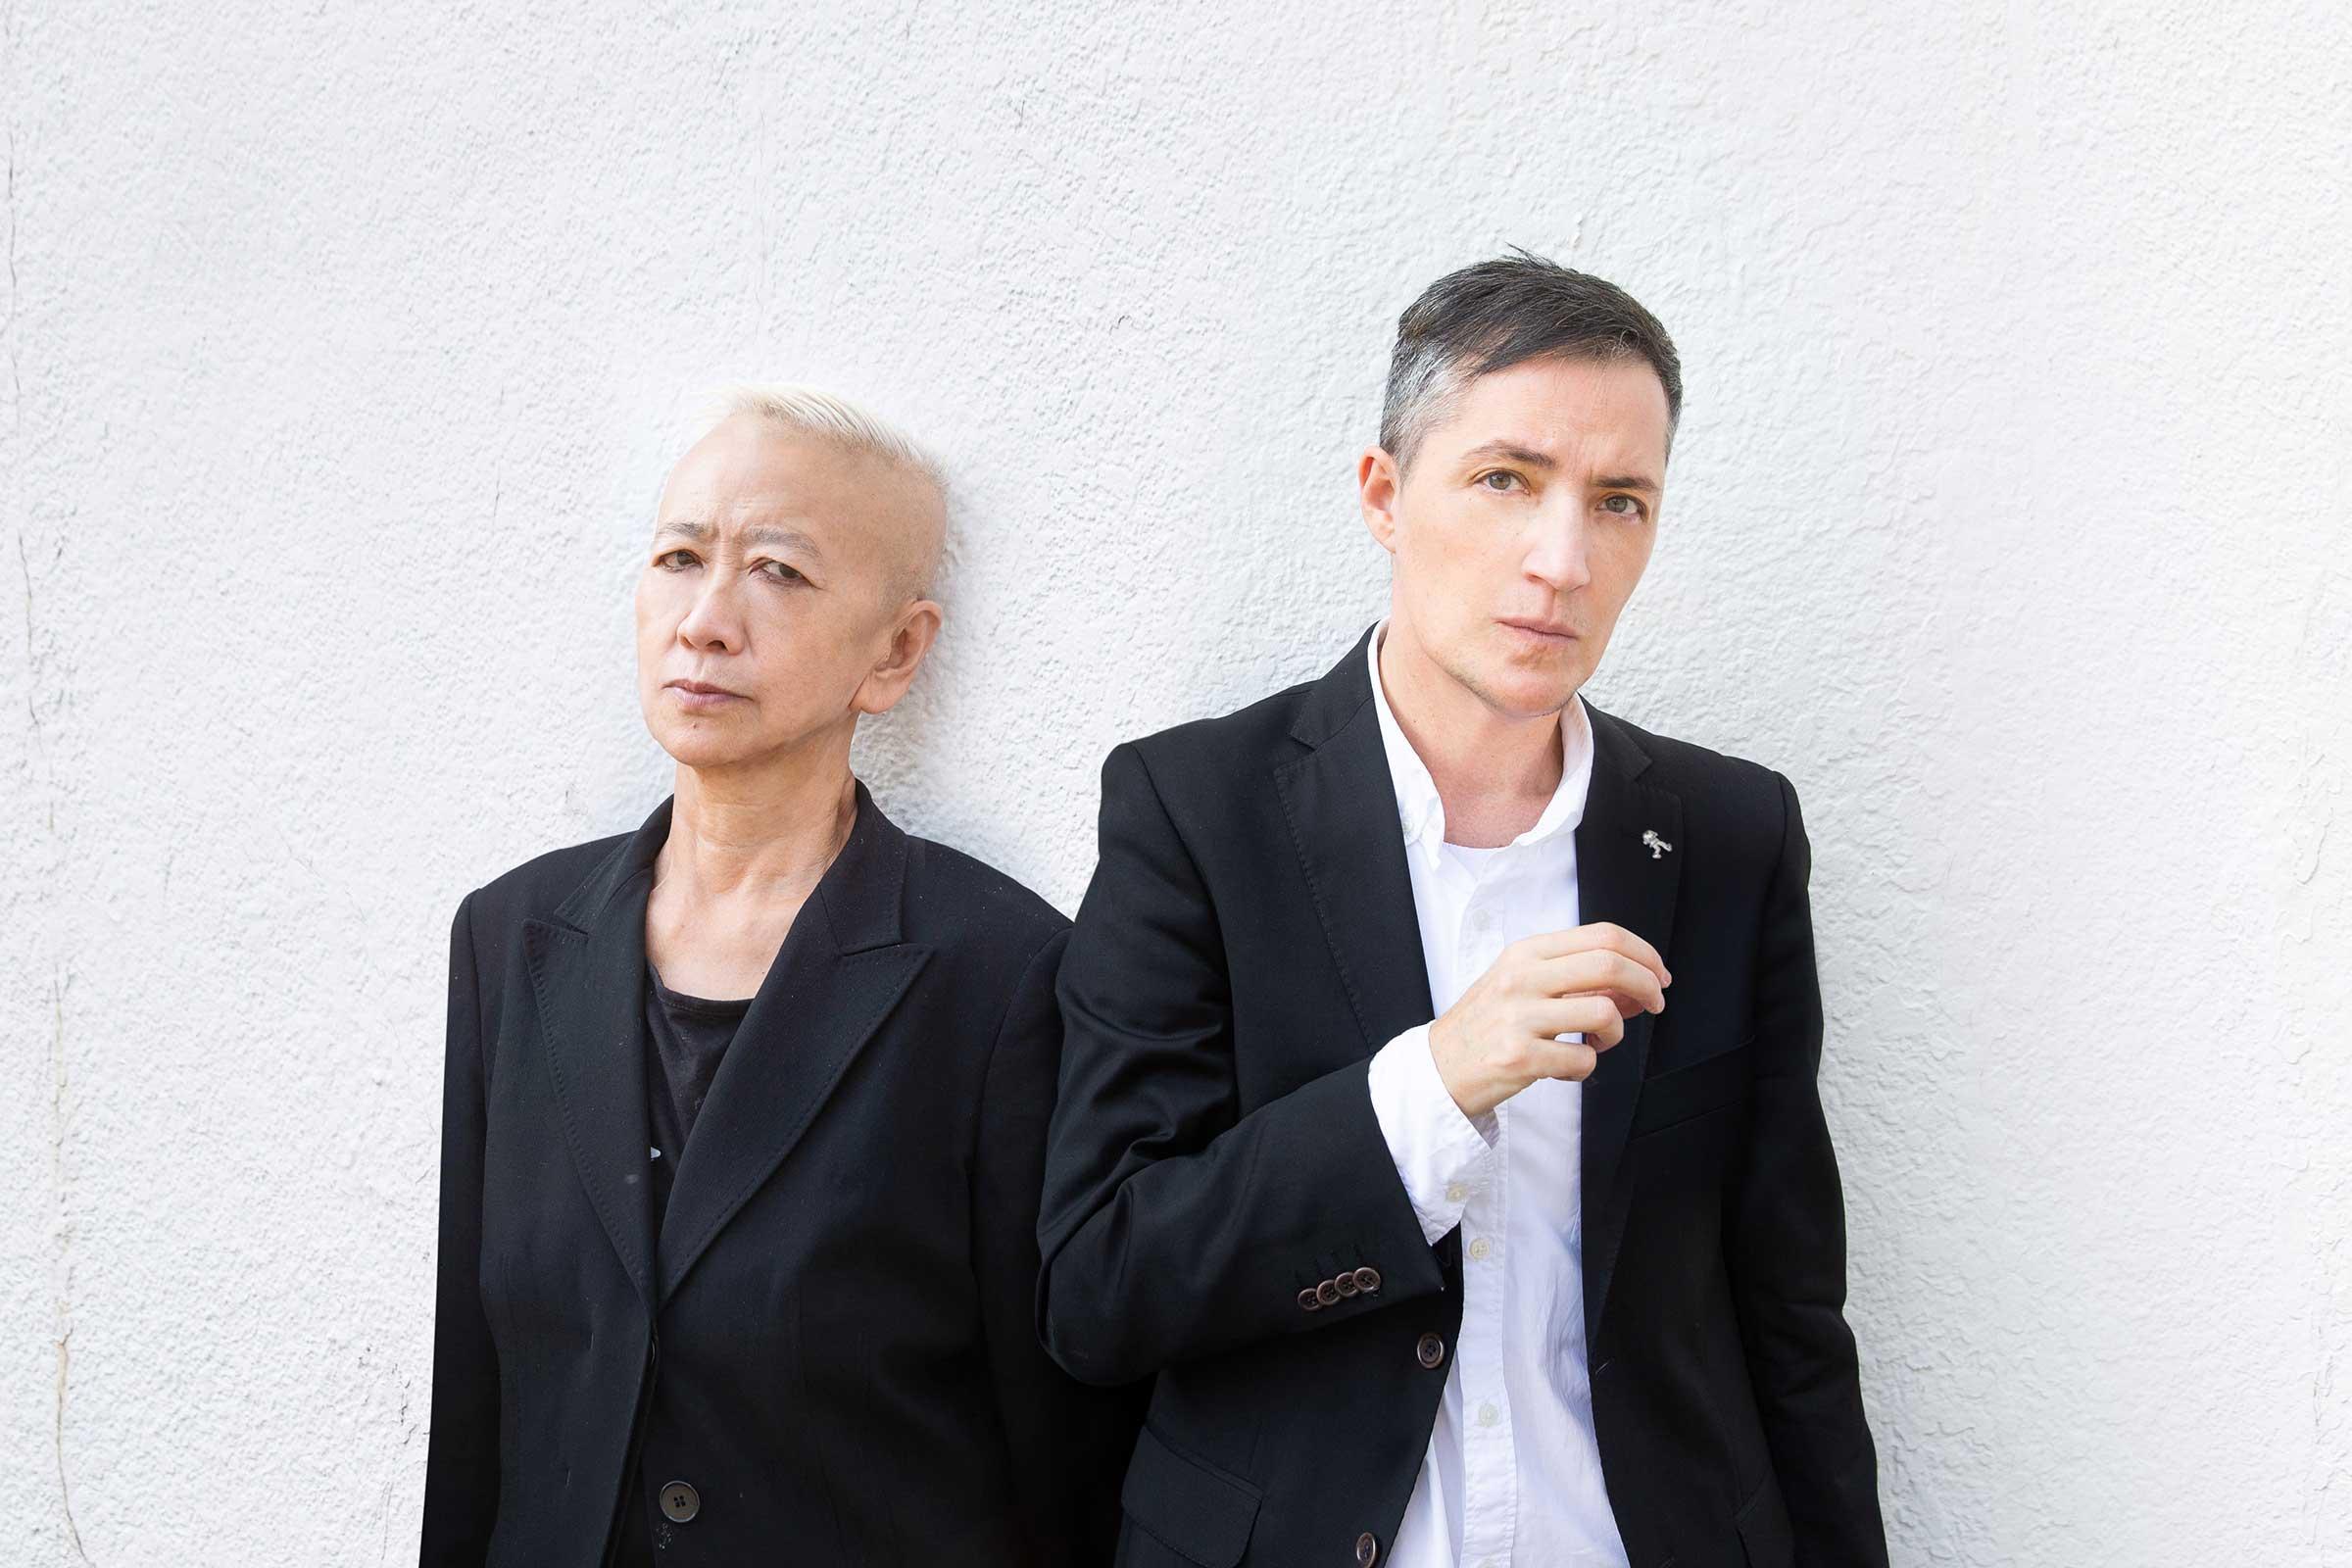 Shu Lea Cheang with curator Paul B Preciado. Image ©TFAM